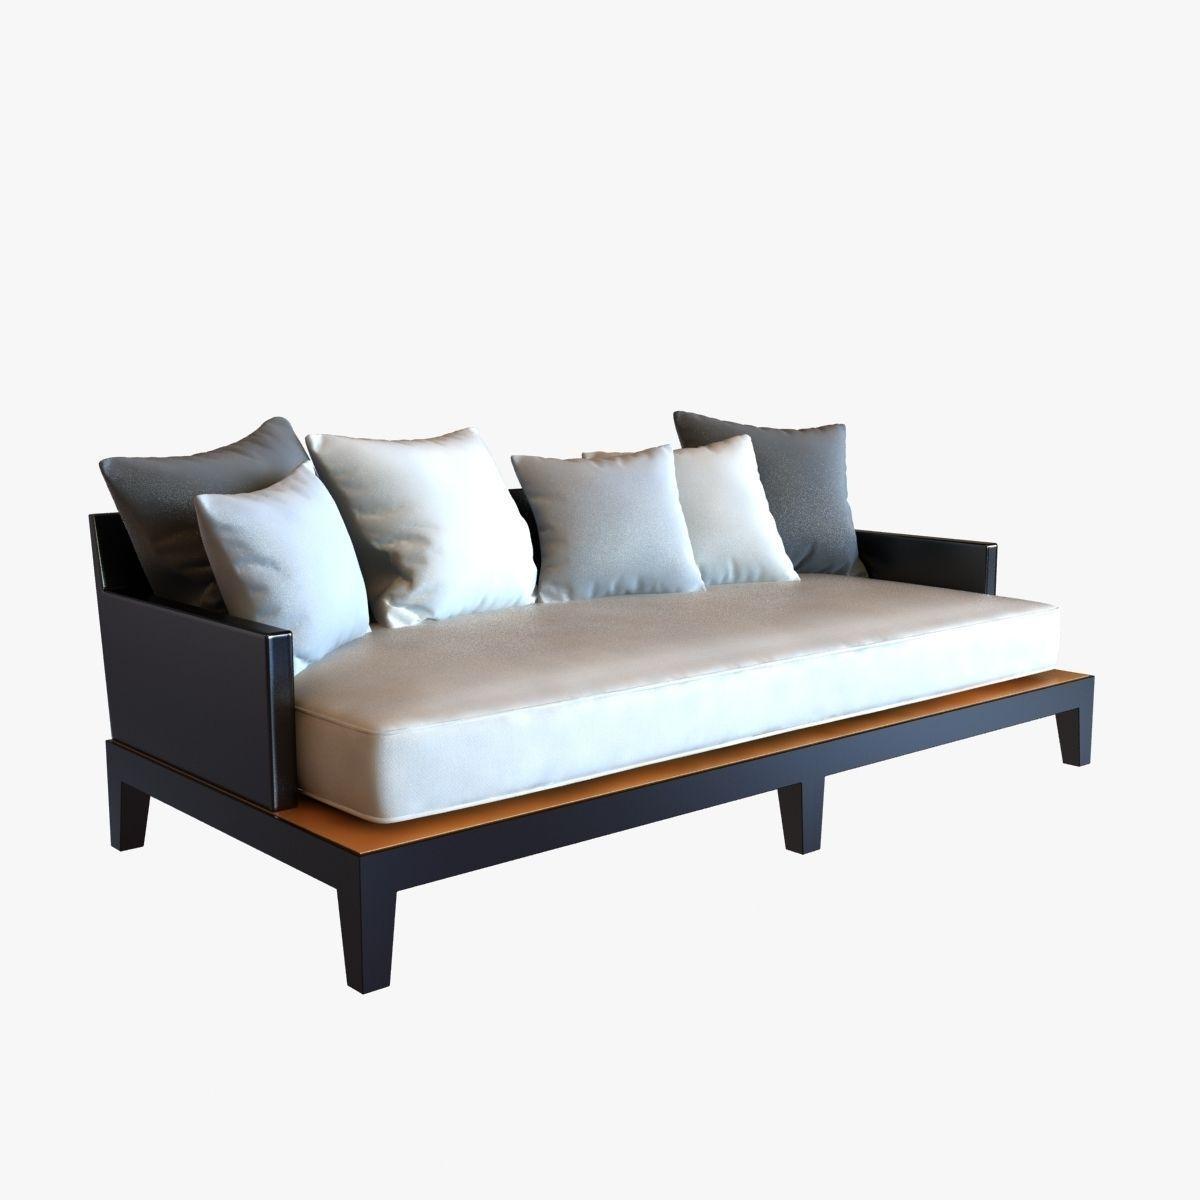 Christian Liaigre Sofa For Holly Hunt Opium 3d Model Max Obj 3ds Fbx Mtl 1